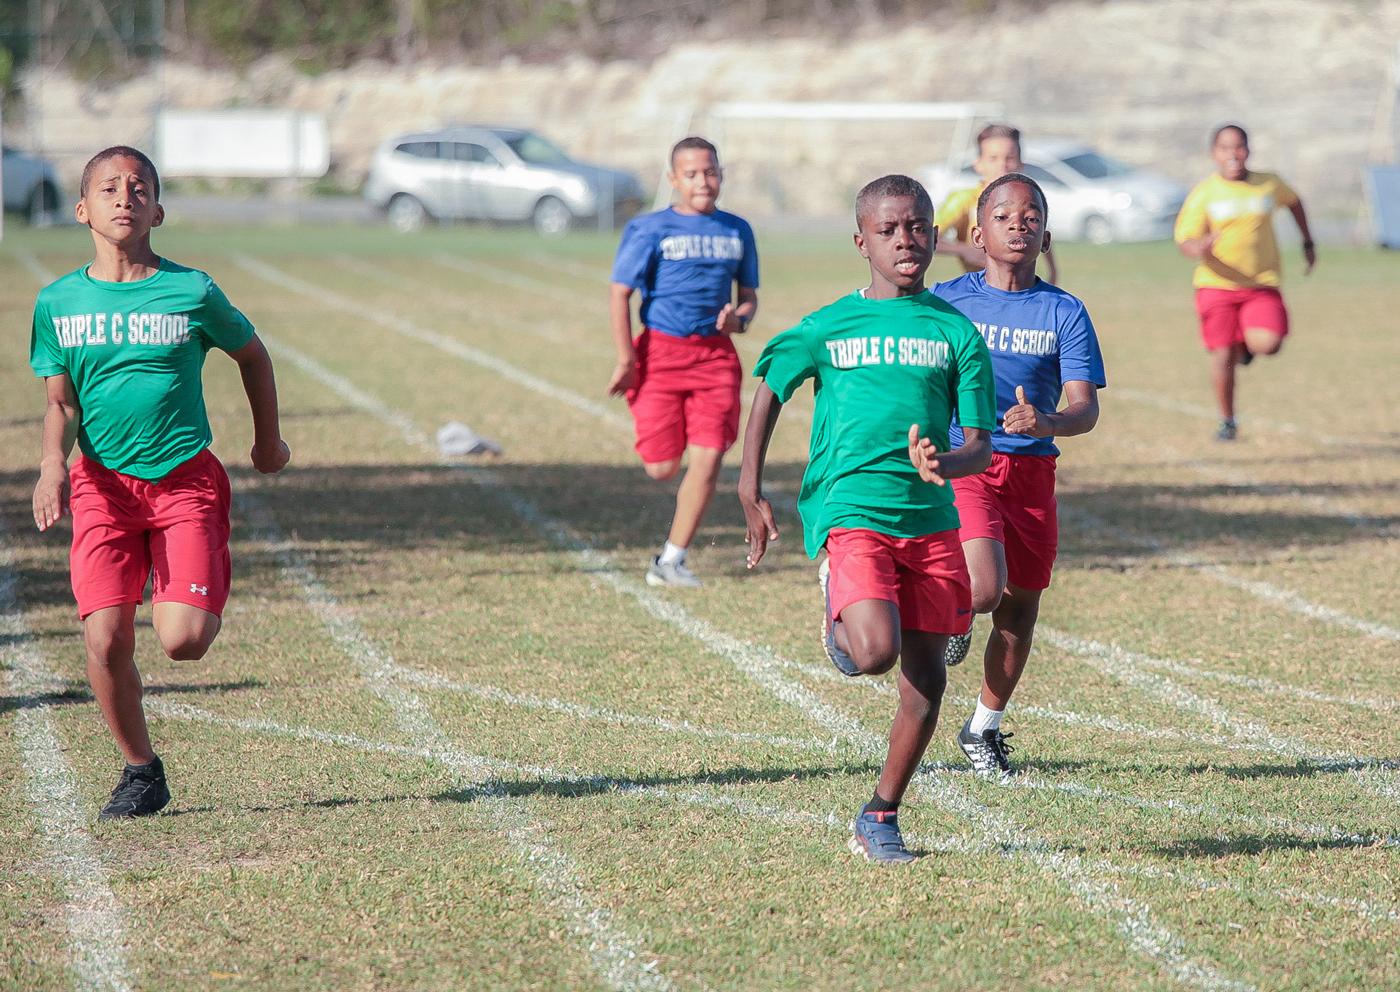 Triple C School Athletics with regard to Triple C School